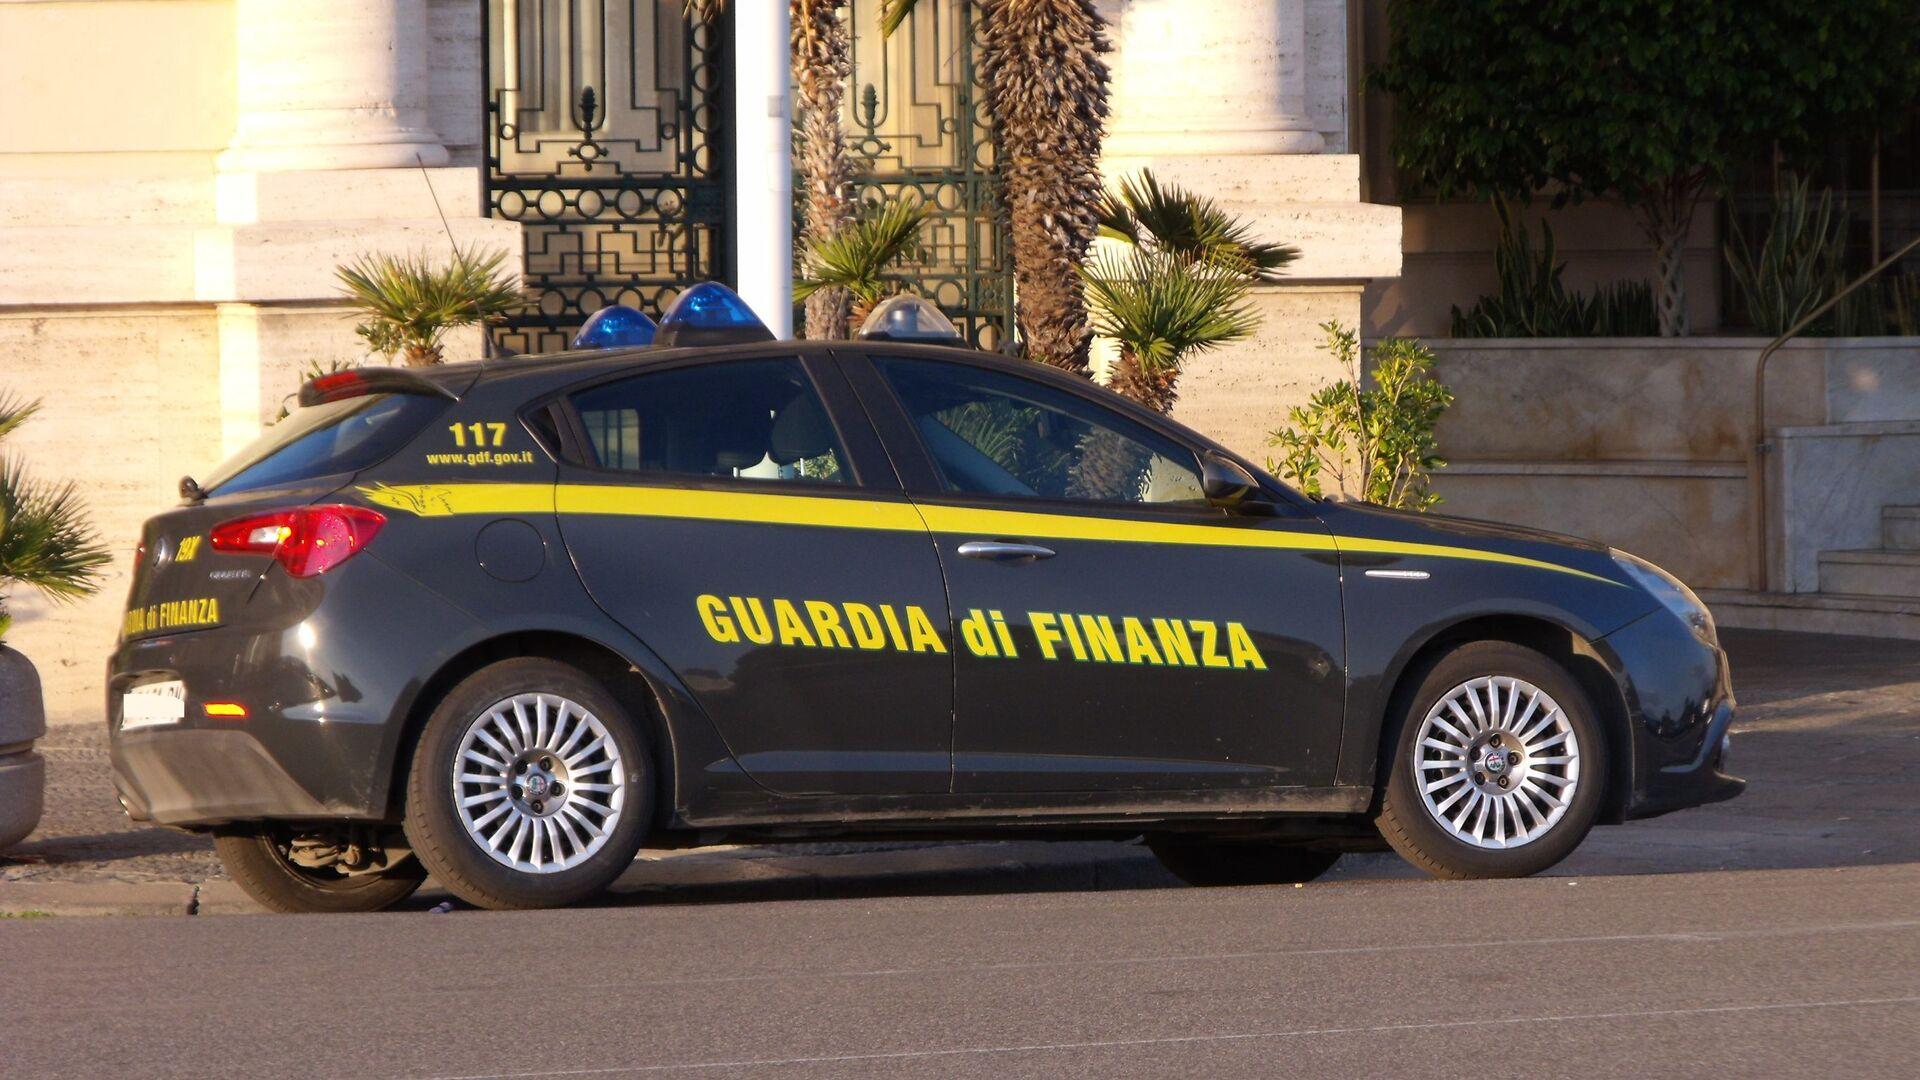 Autovettura guardia di finanza - Sputnik Italia, 1920, 08.03.2021